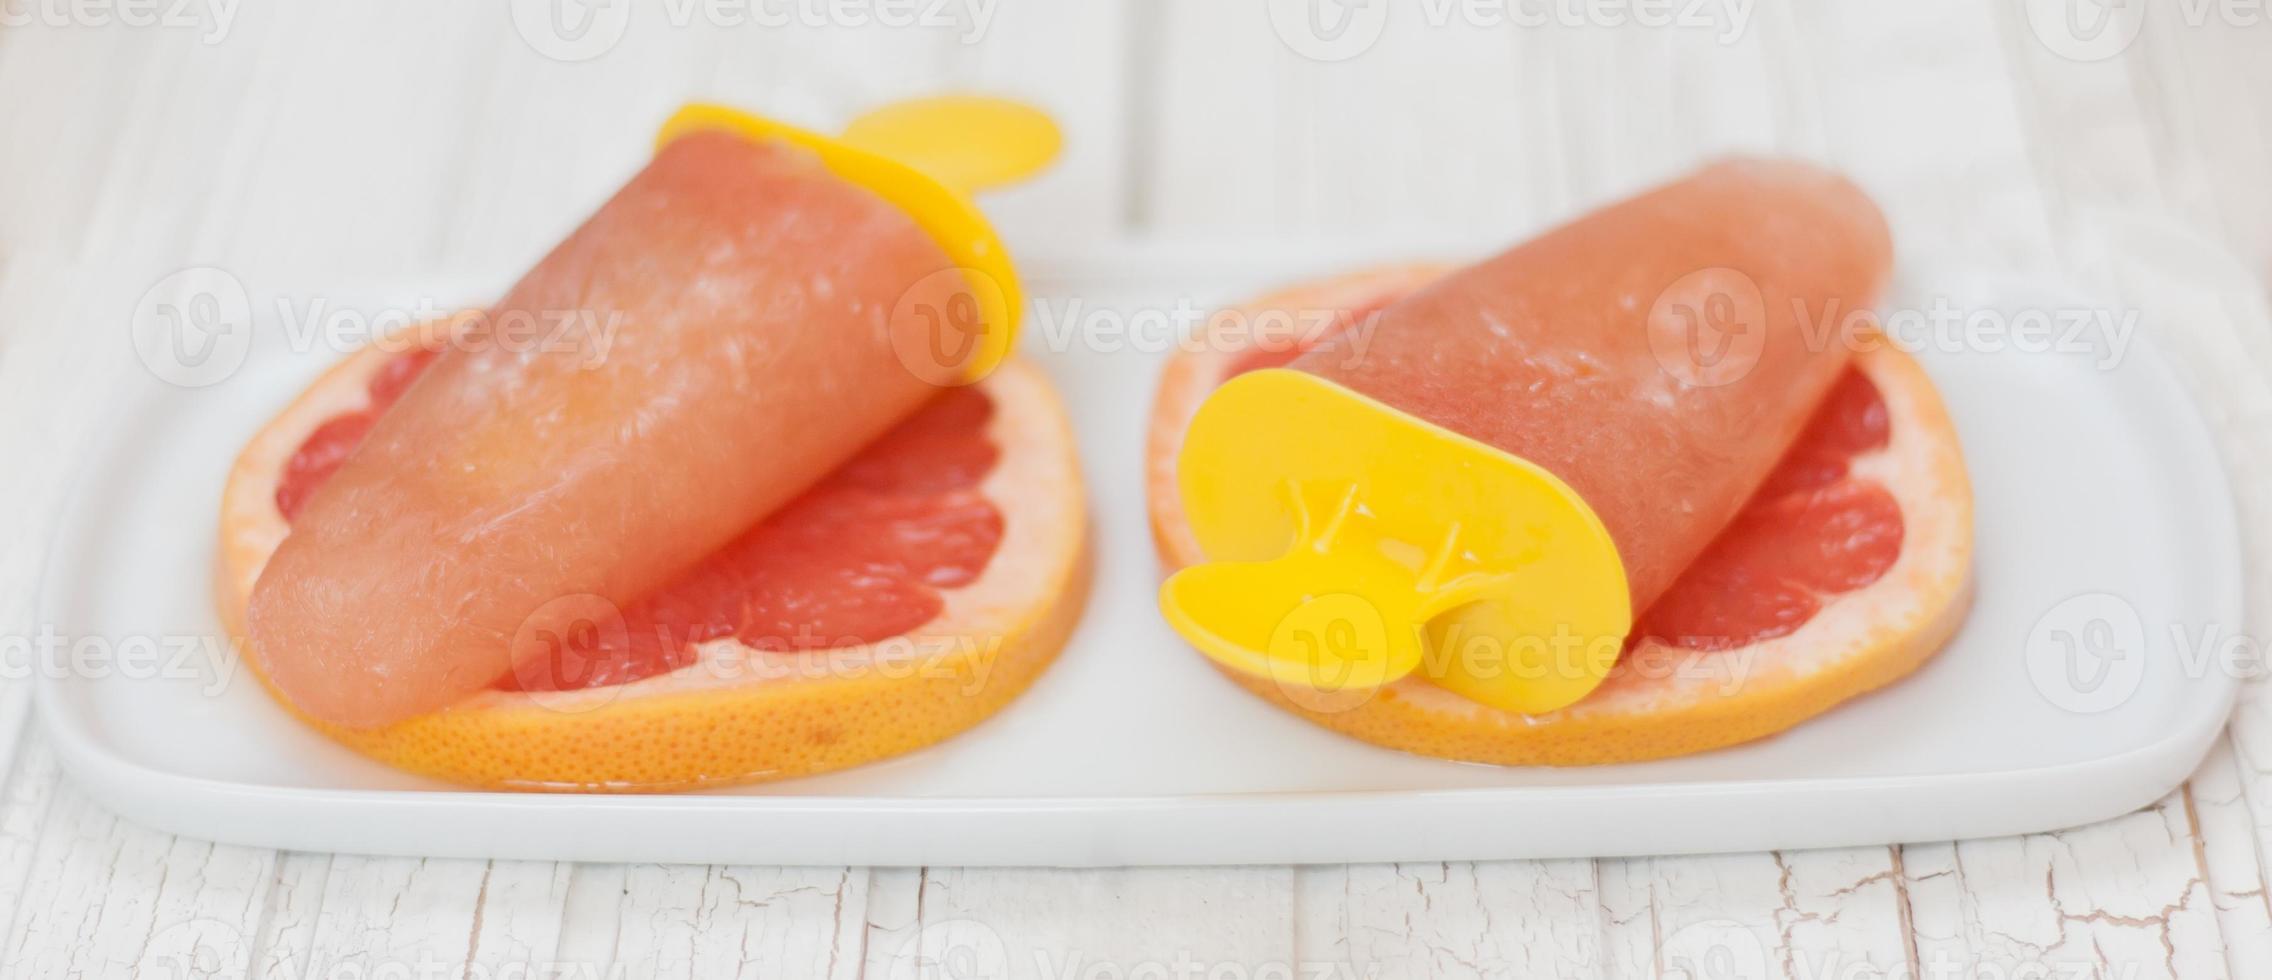 picolés de frutas servidos em fatias de toranja foto